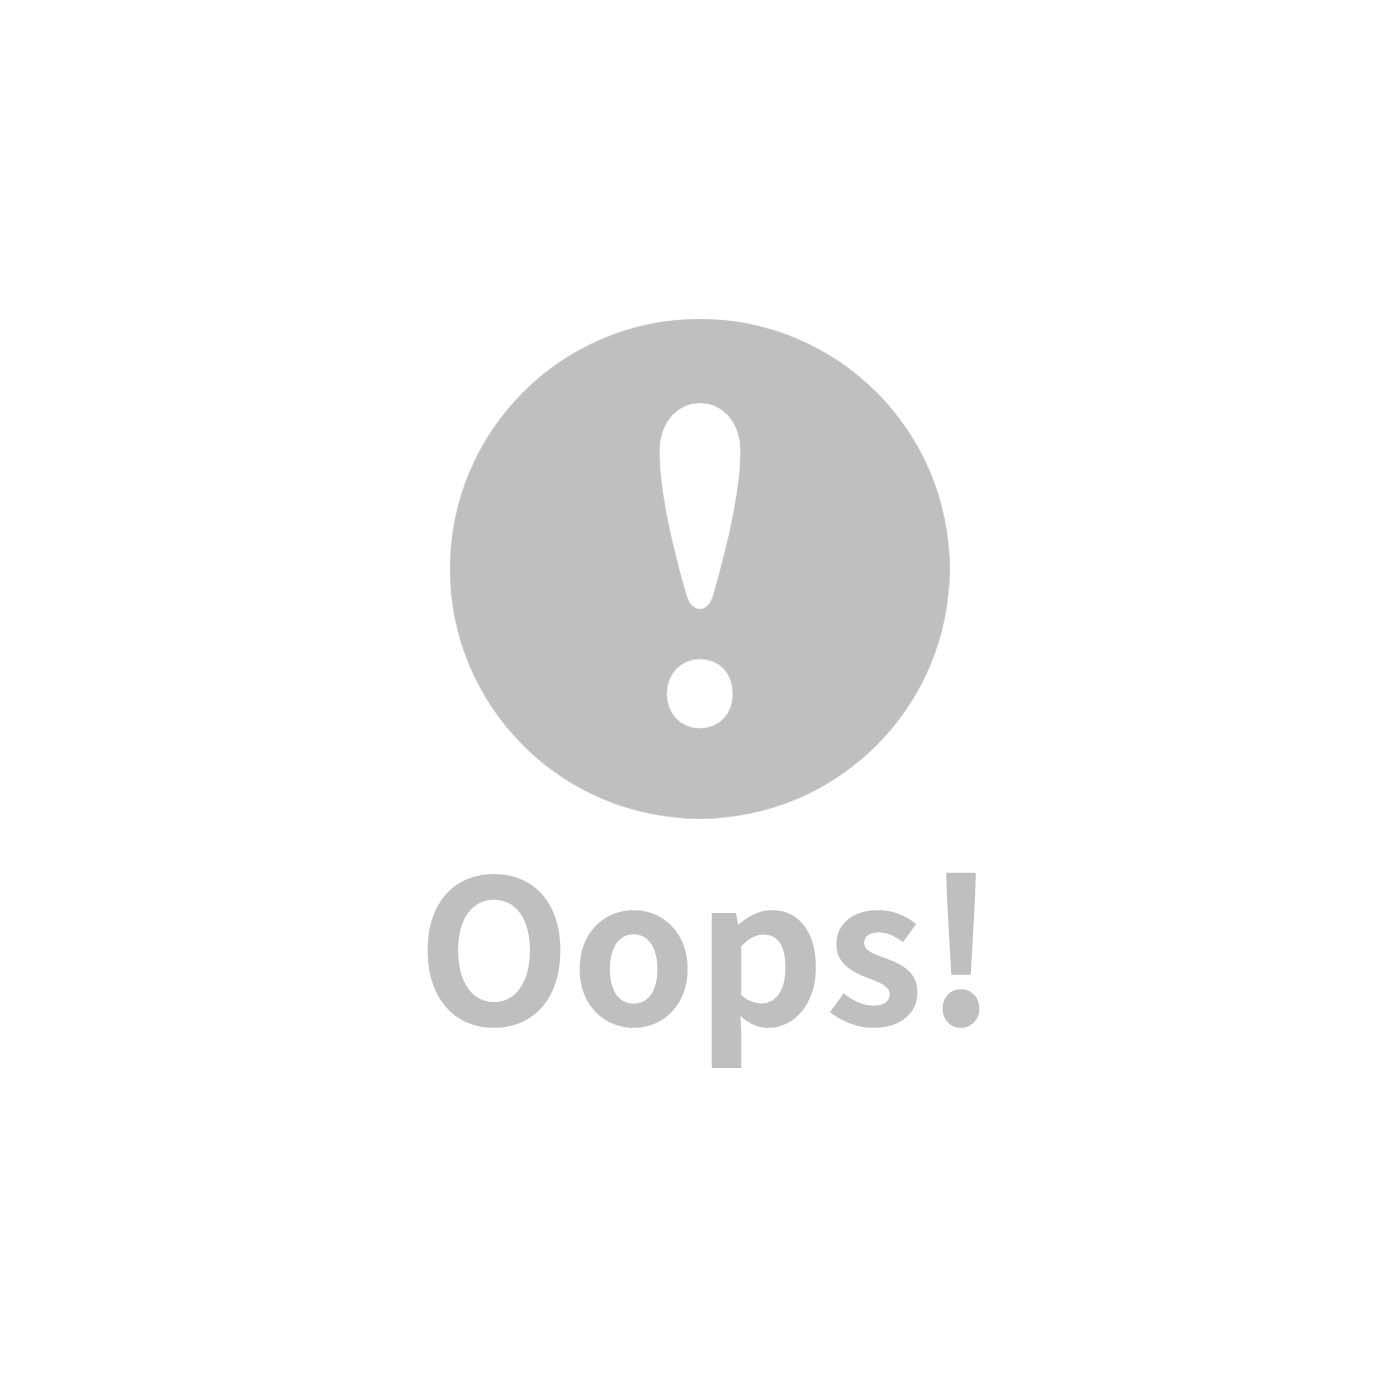 Cuna Tent x Sagepole成長美學小木屋 (印第安那王國)